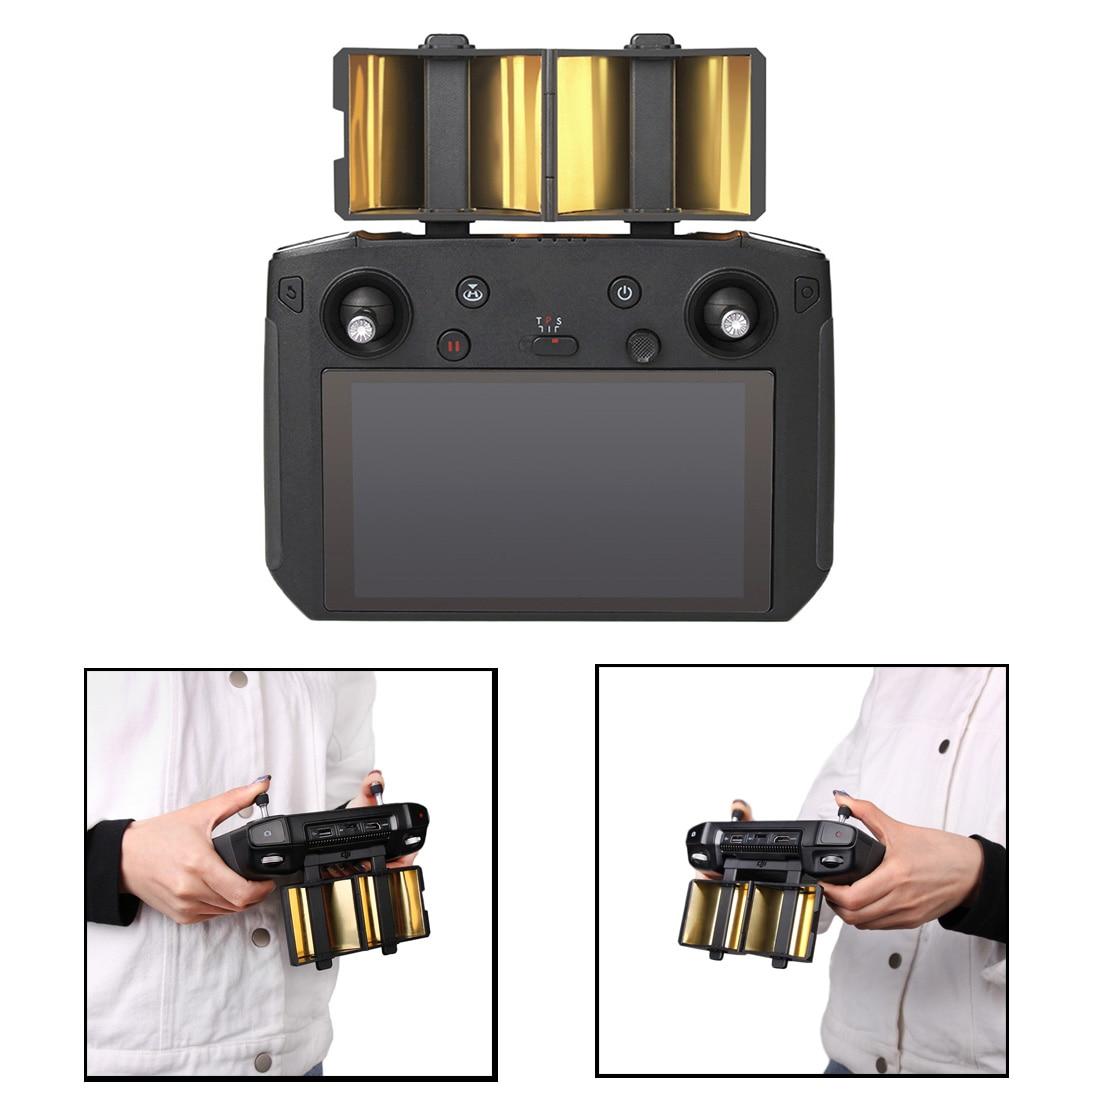 SUNNYLIFE New Arrival For DJI Smart Remote Controller Antenna Signal Booster Range Extender For DJI MAVIC 2 PRO/ ZOOM Travel